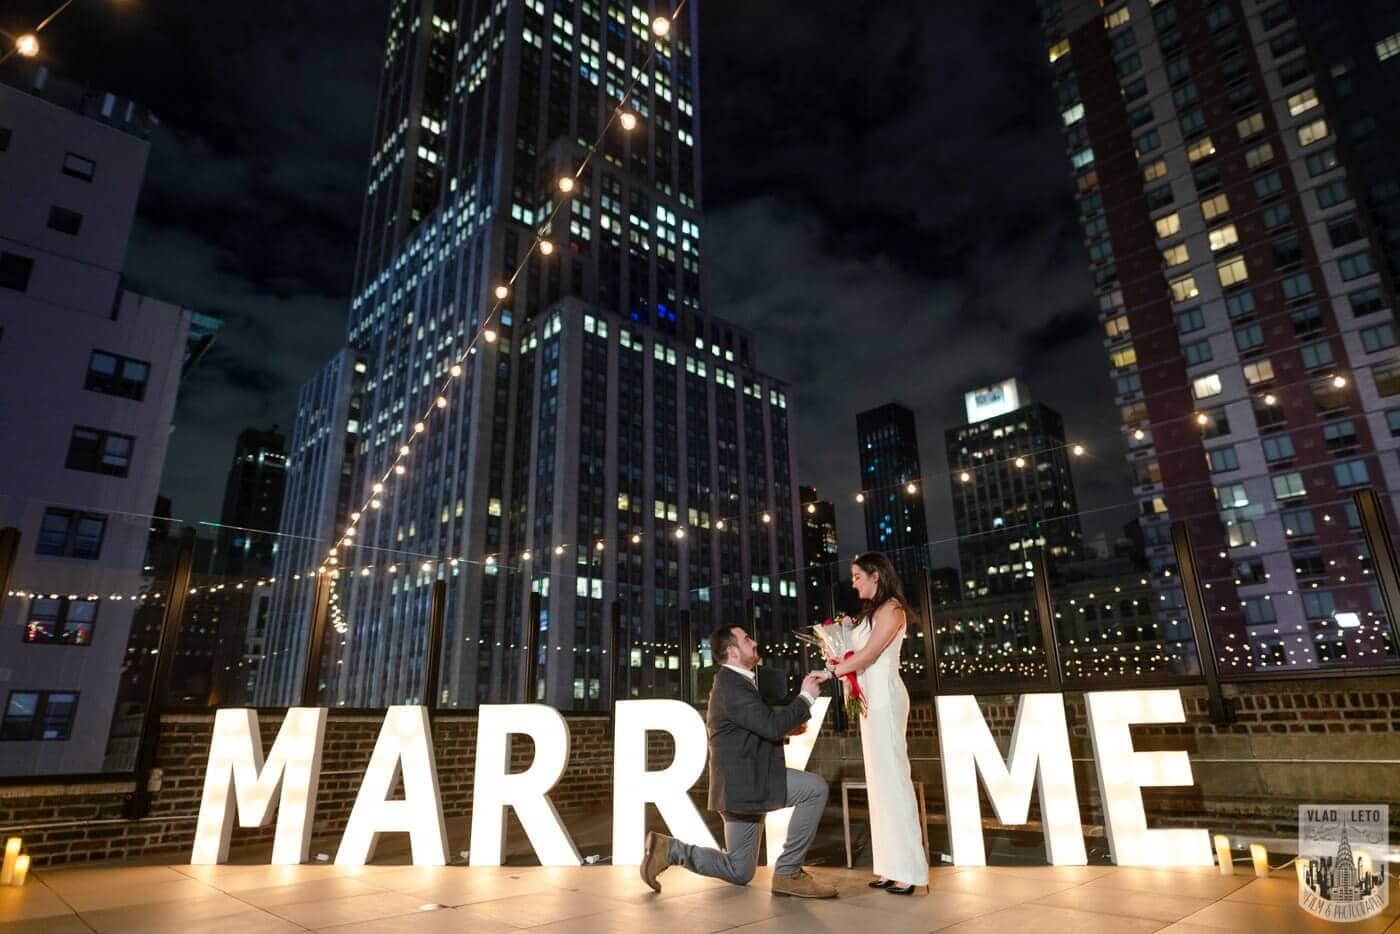 Photo 2 Gigantic Marry Me Letters Rooftop Proposal | VladLeto